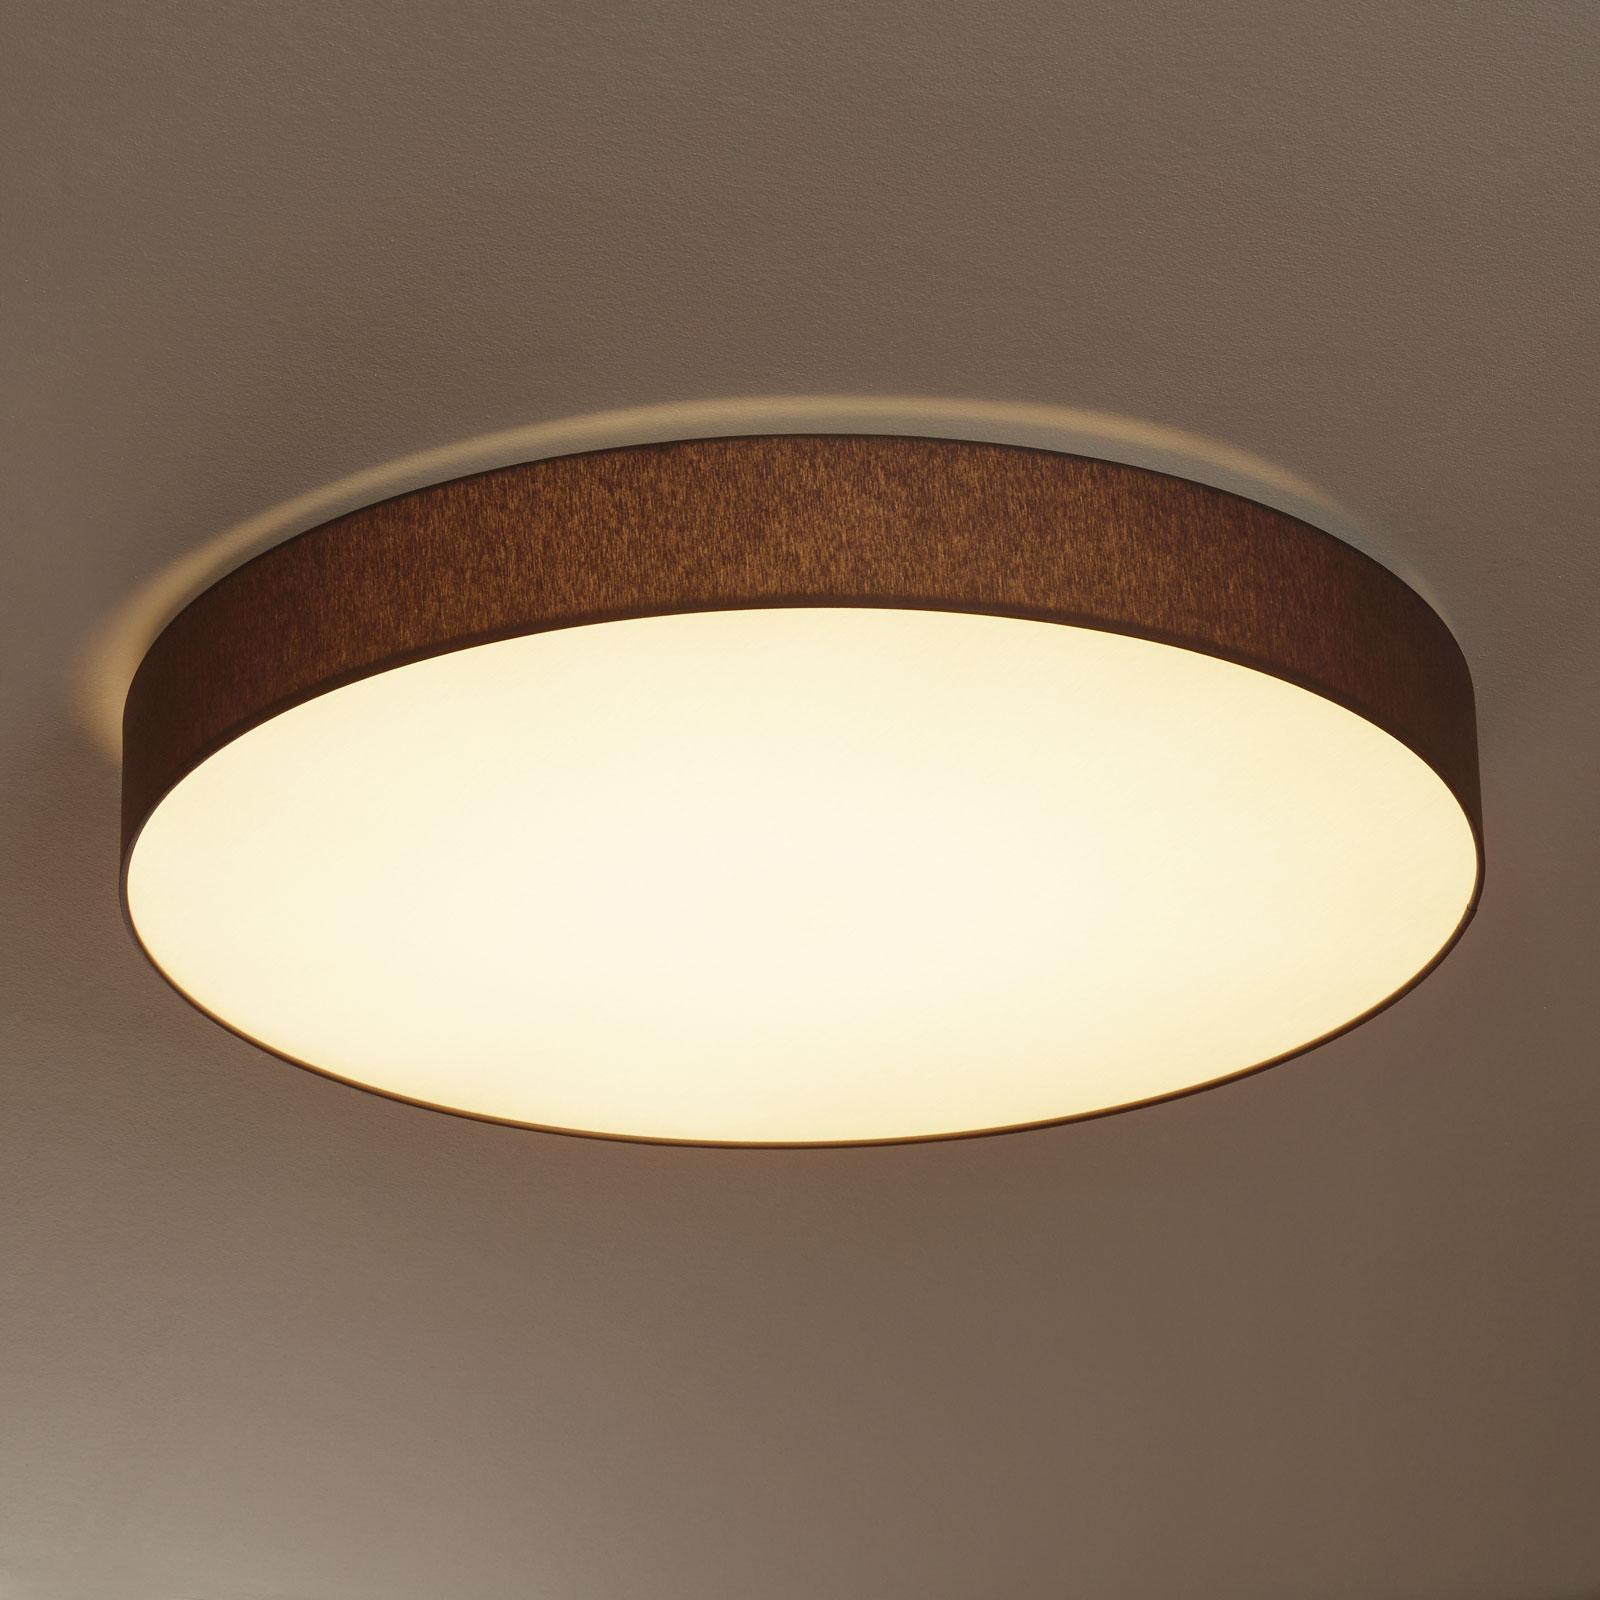 Lampa sufitowa LED Luno, klosz z tkaniny chintz